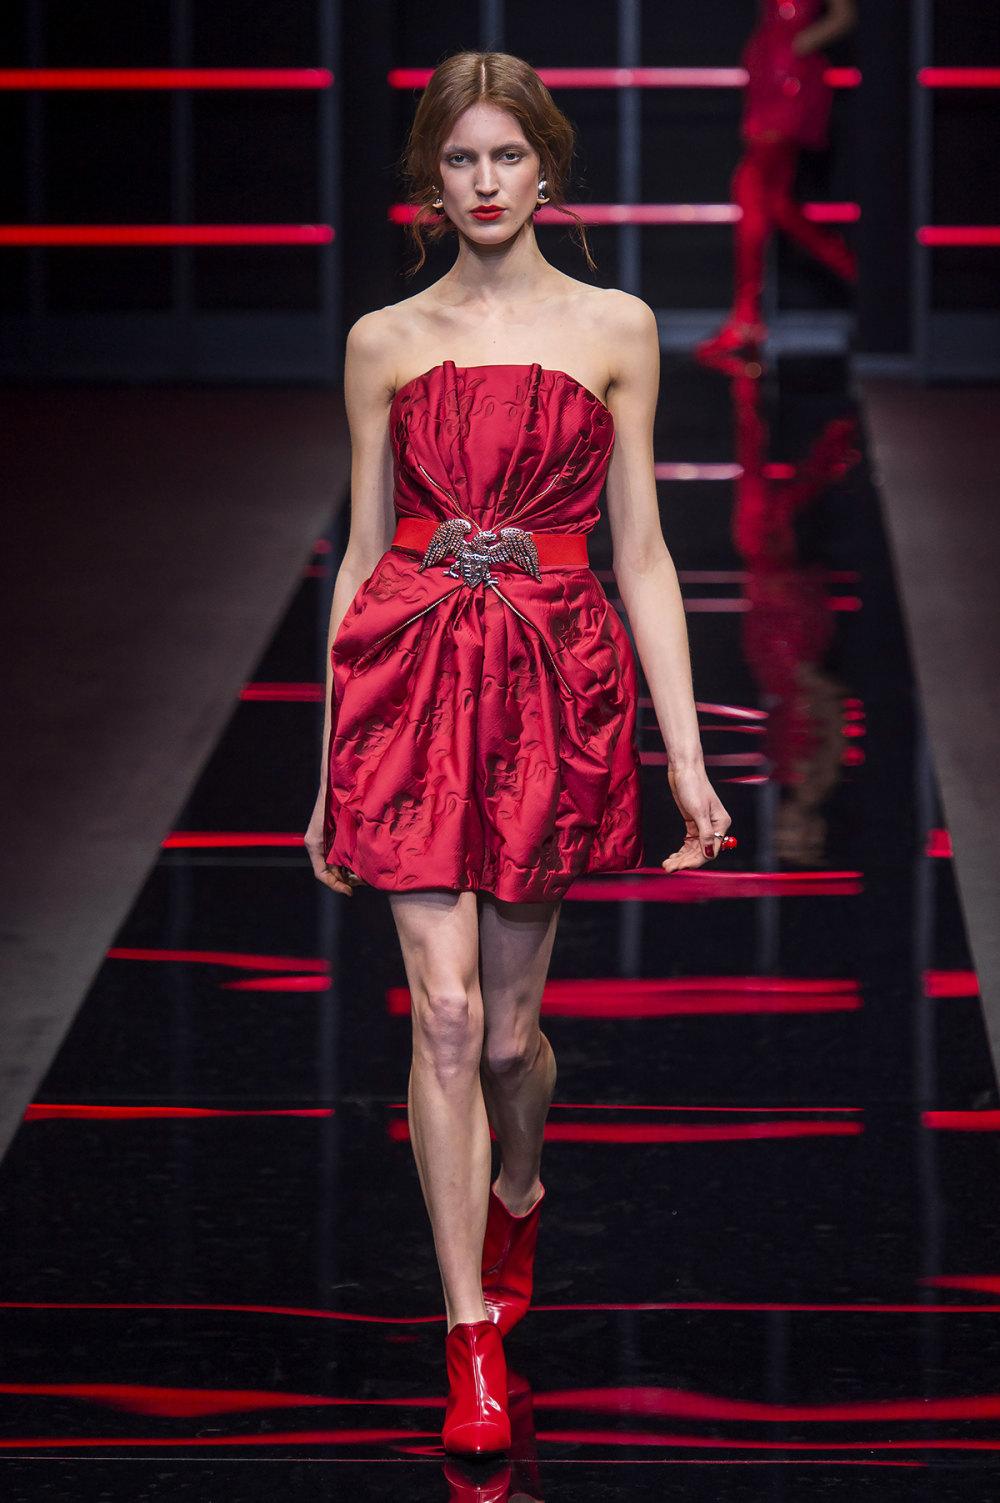 Emporio Armani时装系列畅的裤子带有柔滑裙子的鸡尾酒礼服-59.jpg